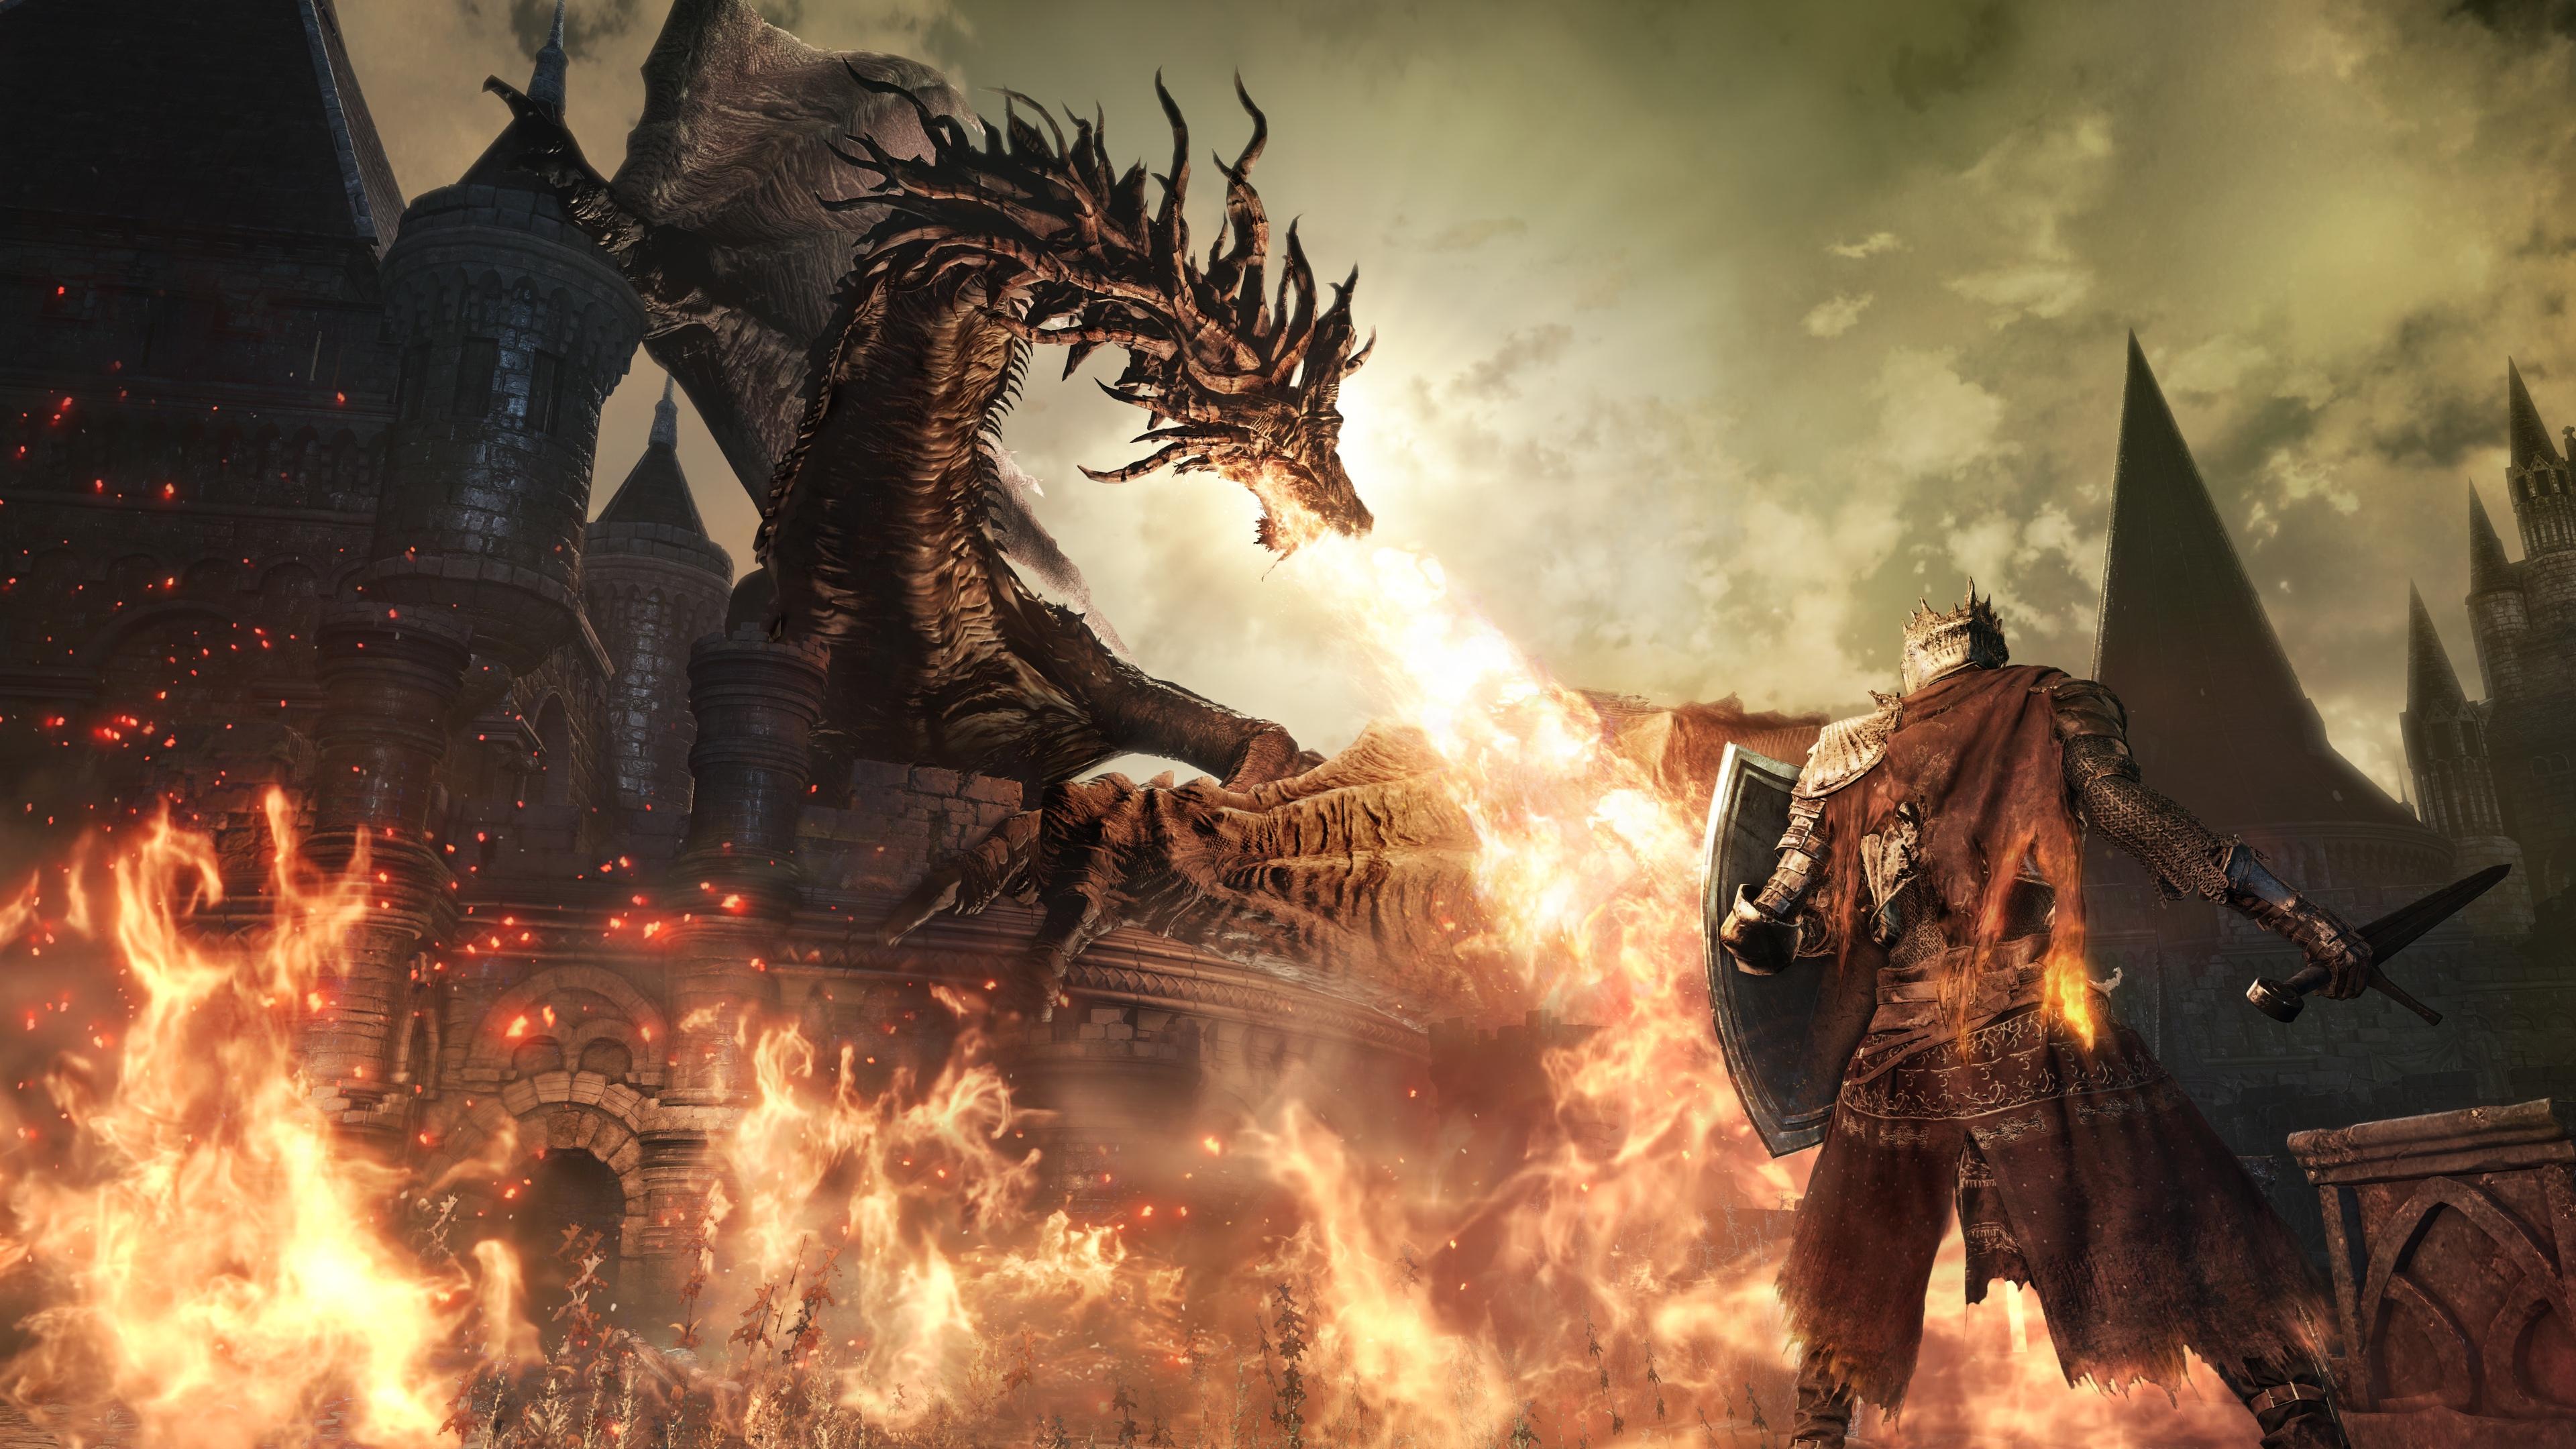 Streamer pulls off five-game, no-hit 'Soulsborne' run, right before Sekiro launch